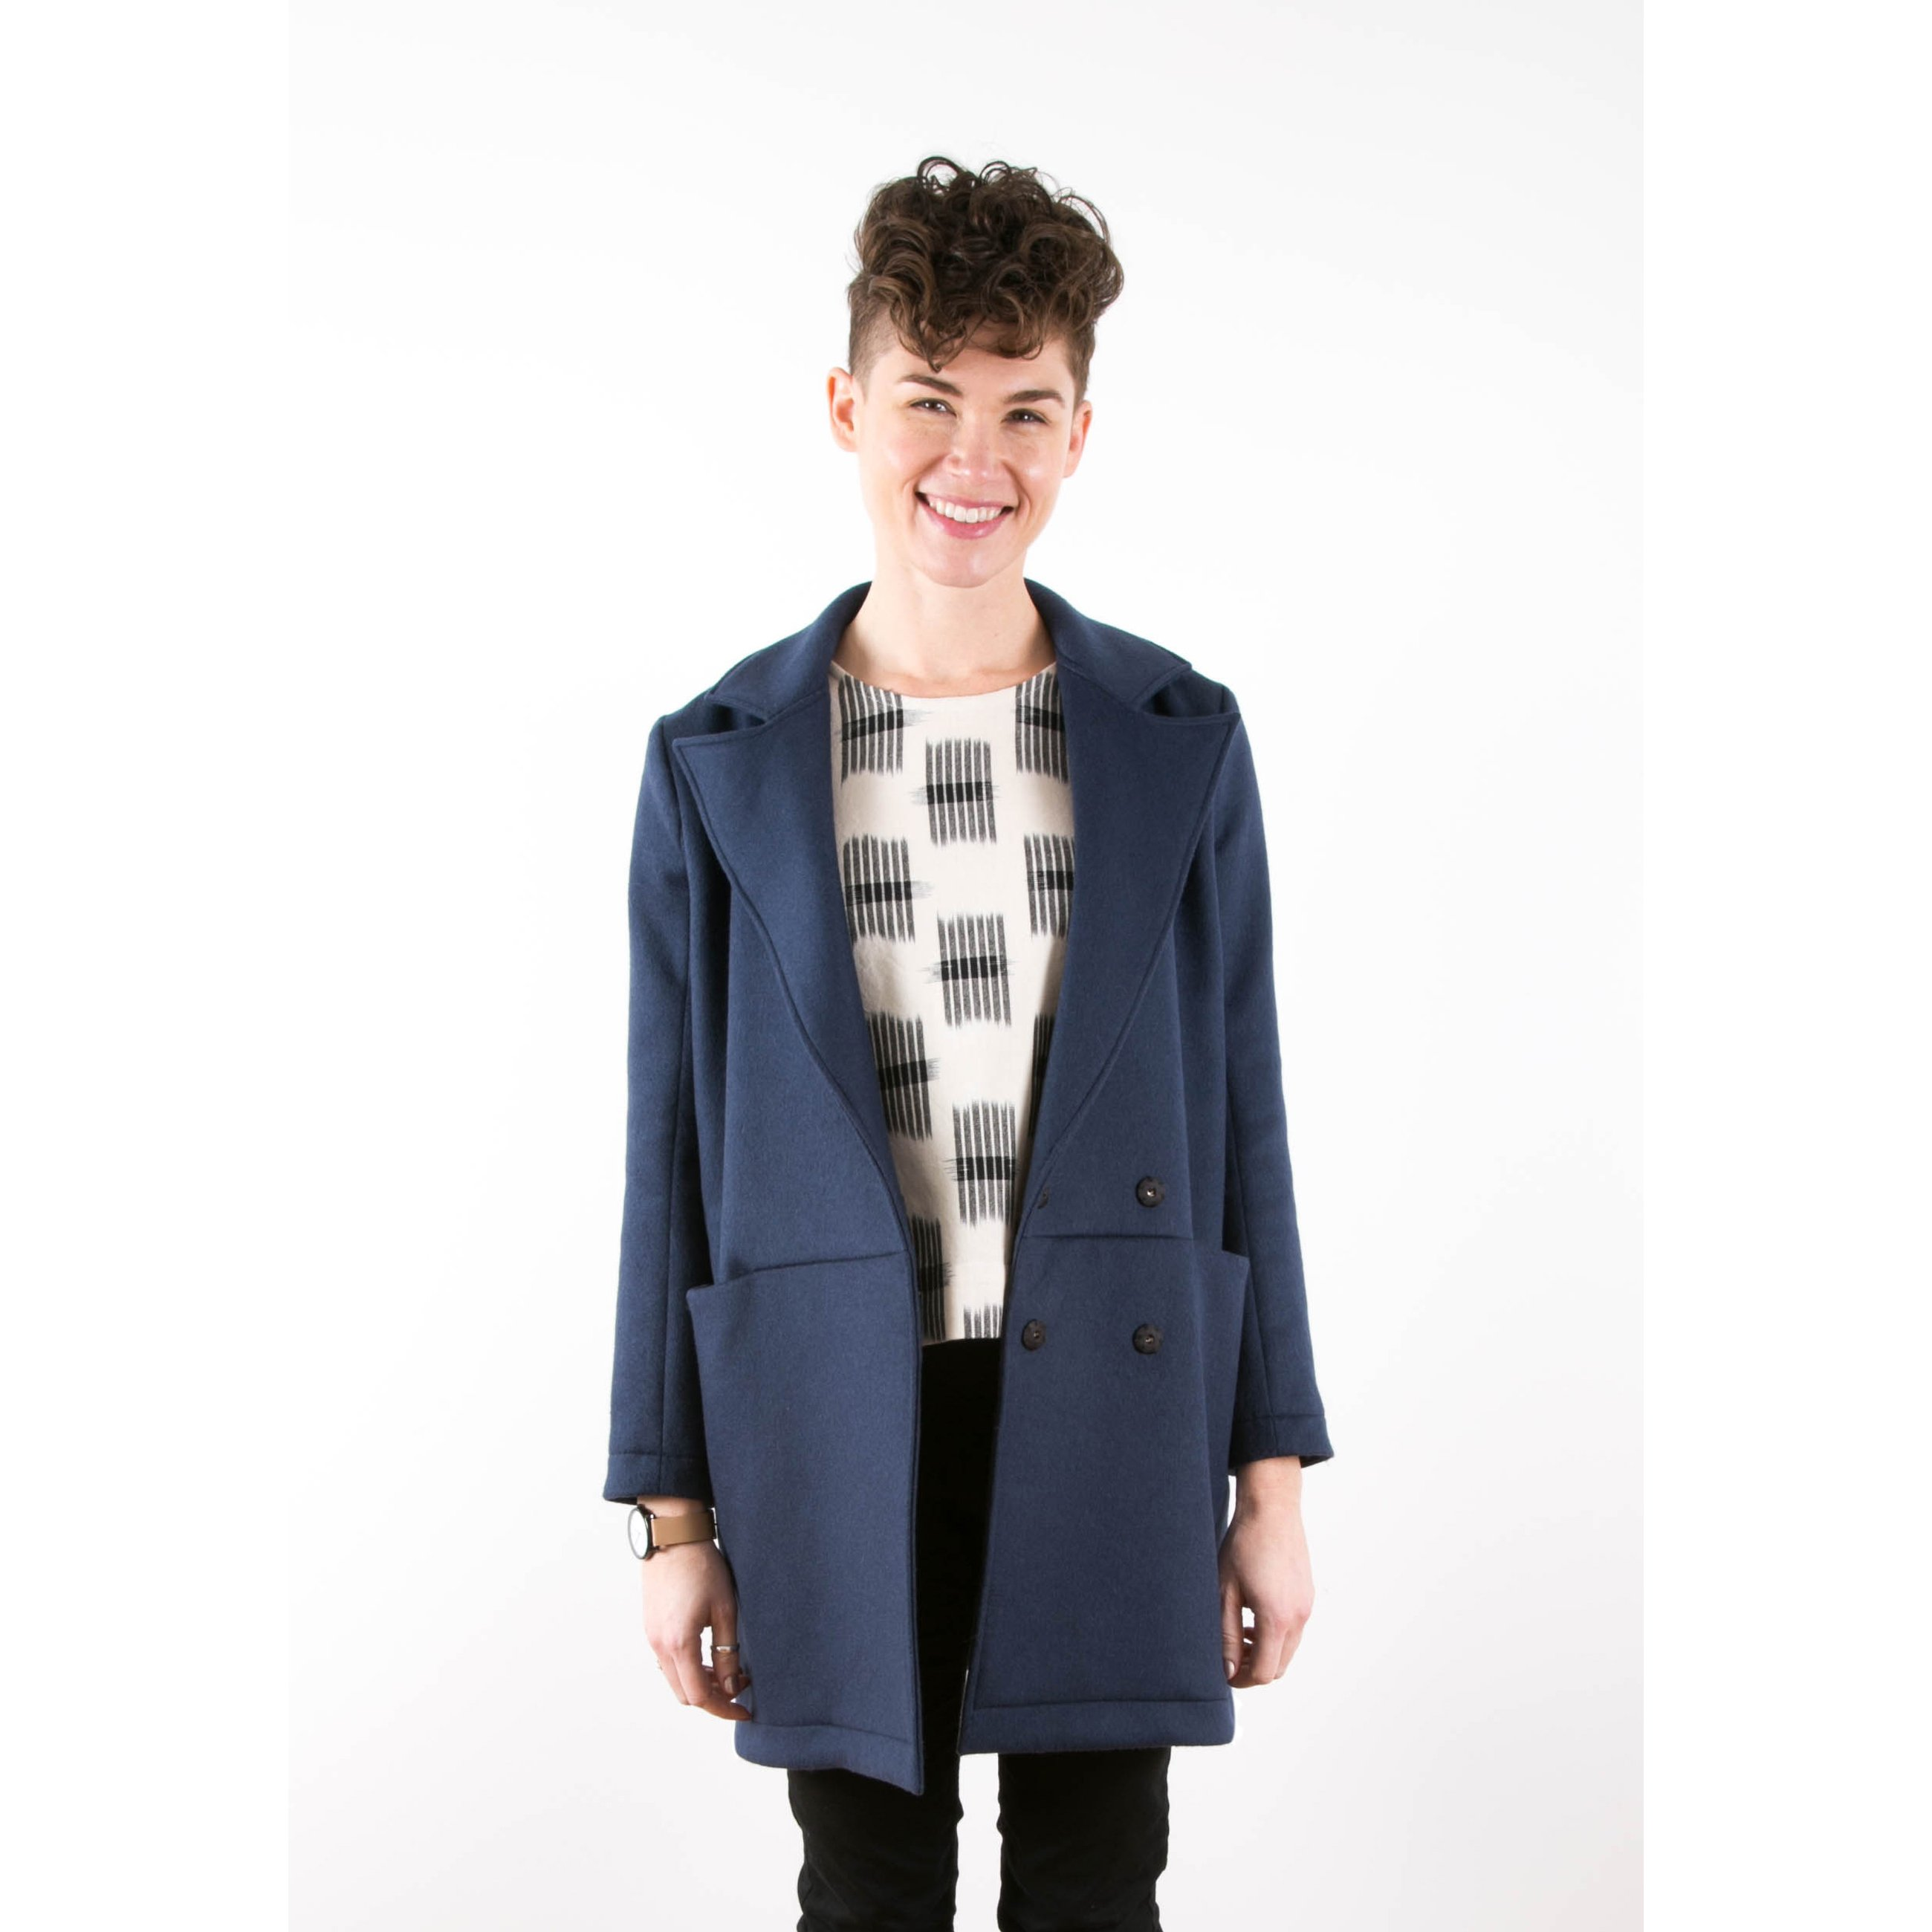 Grainline Studio - Yates Coat Sewing Pattern | Dress Patterns Online